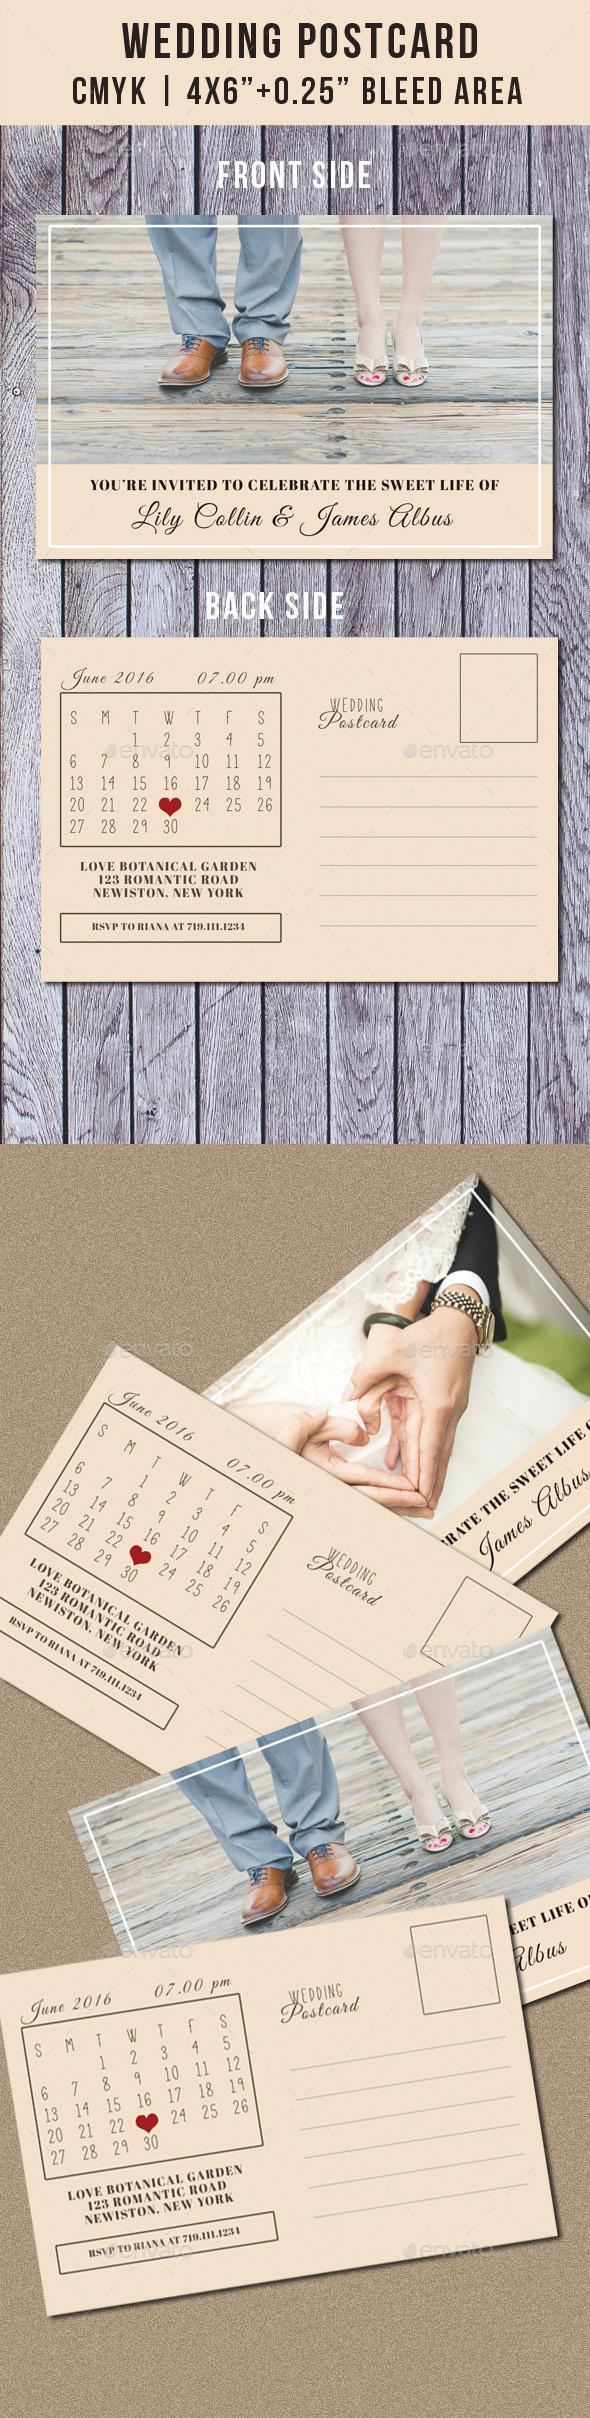 Wedding Postcard Invitation with Calendar Vol.2